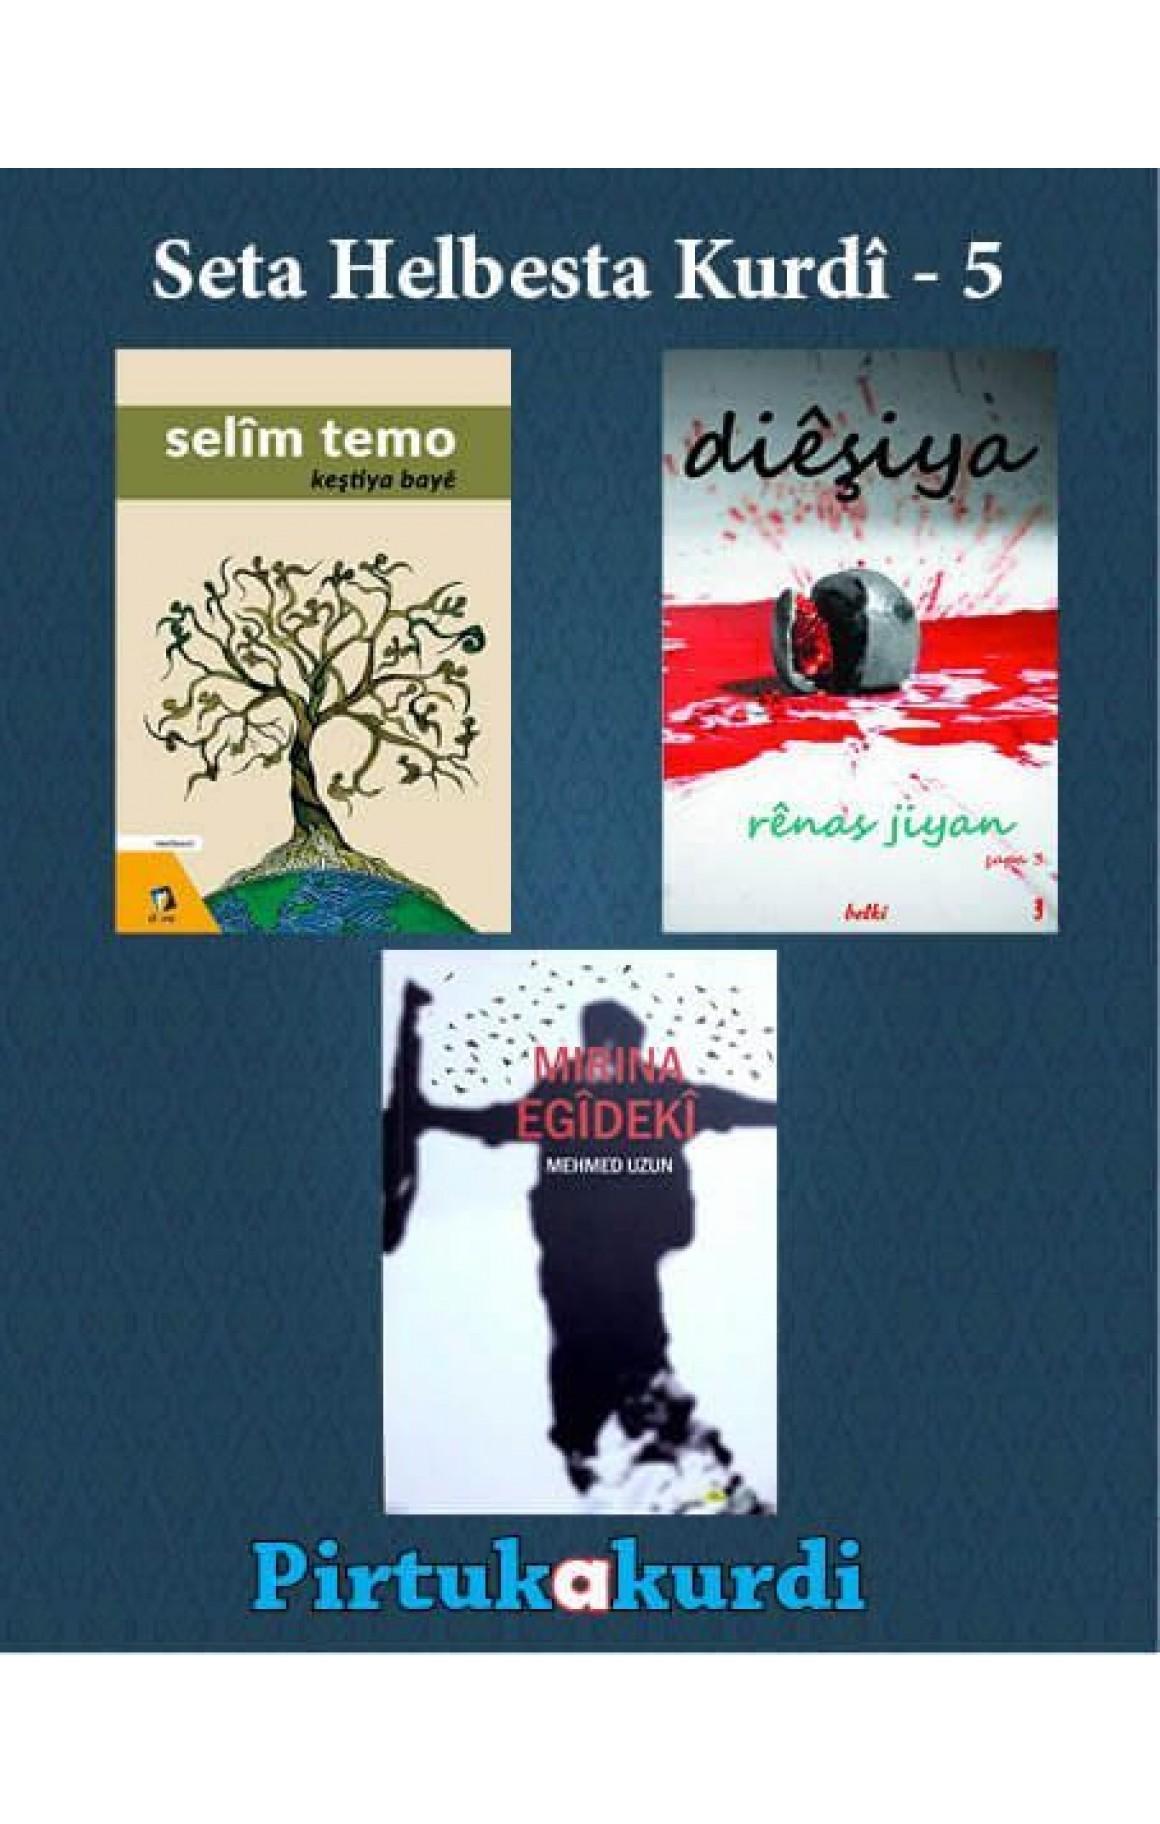 Seta Helbesta Kurdî - 5